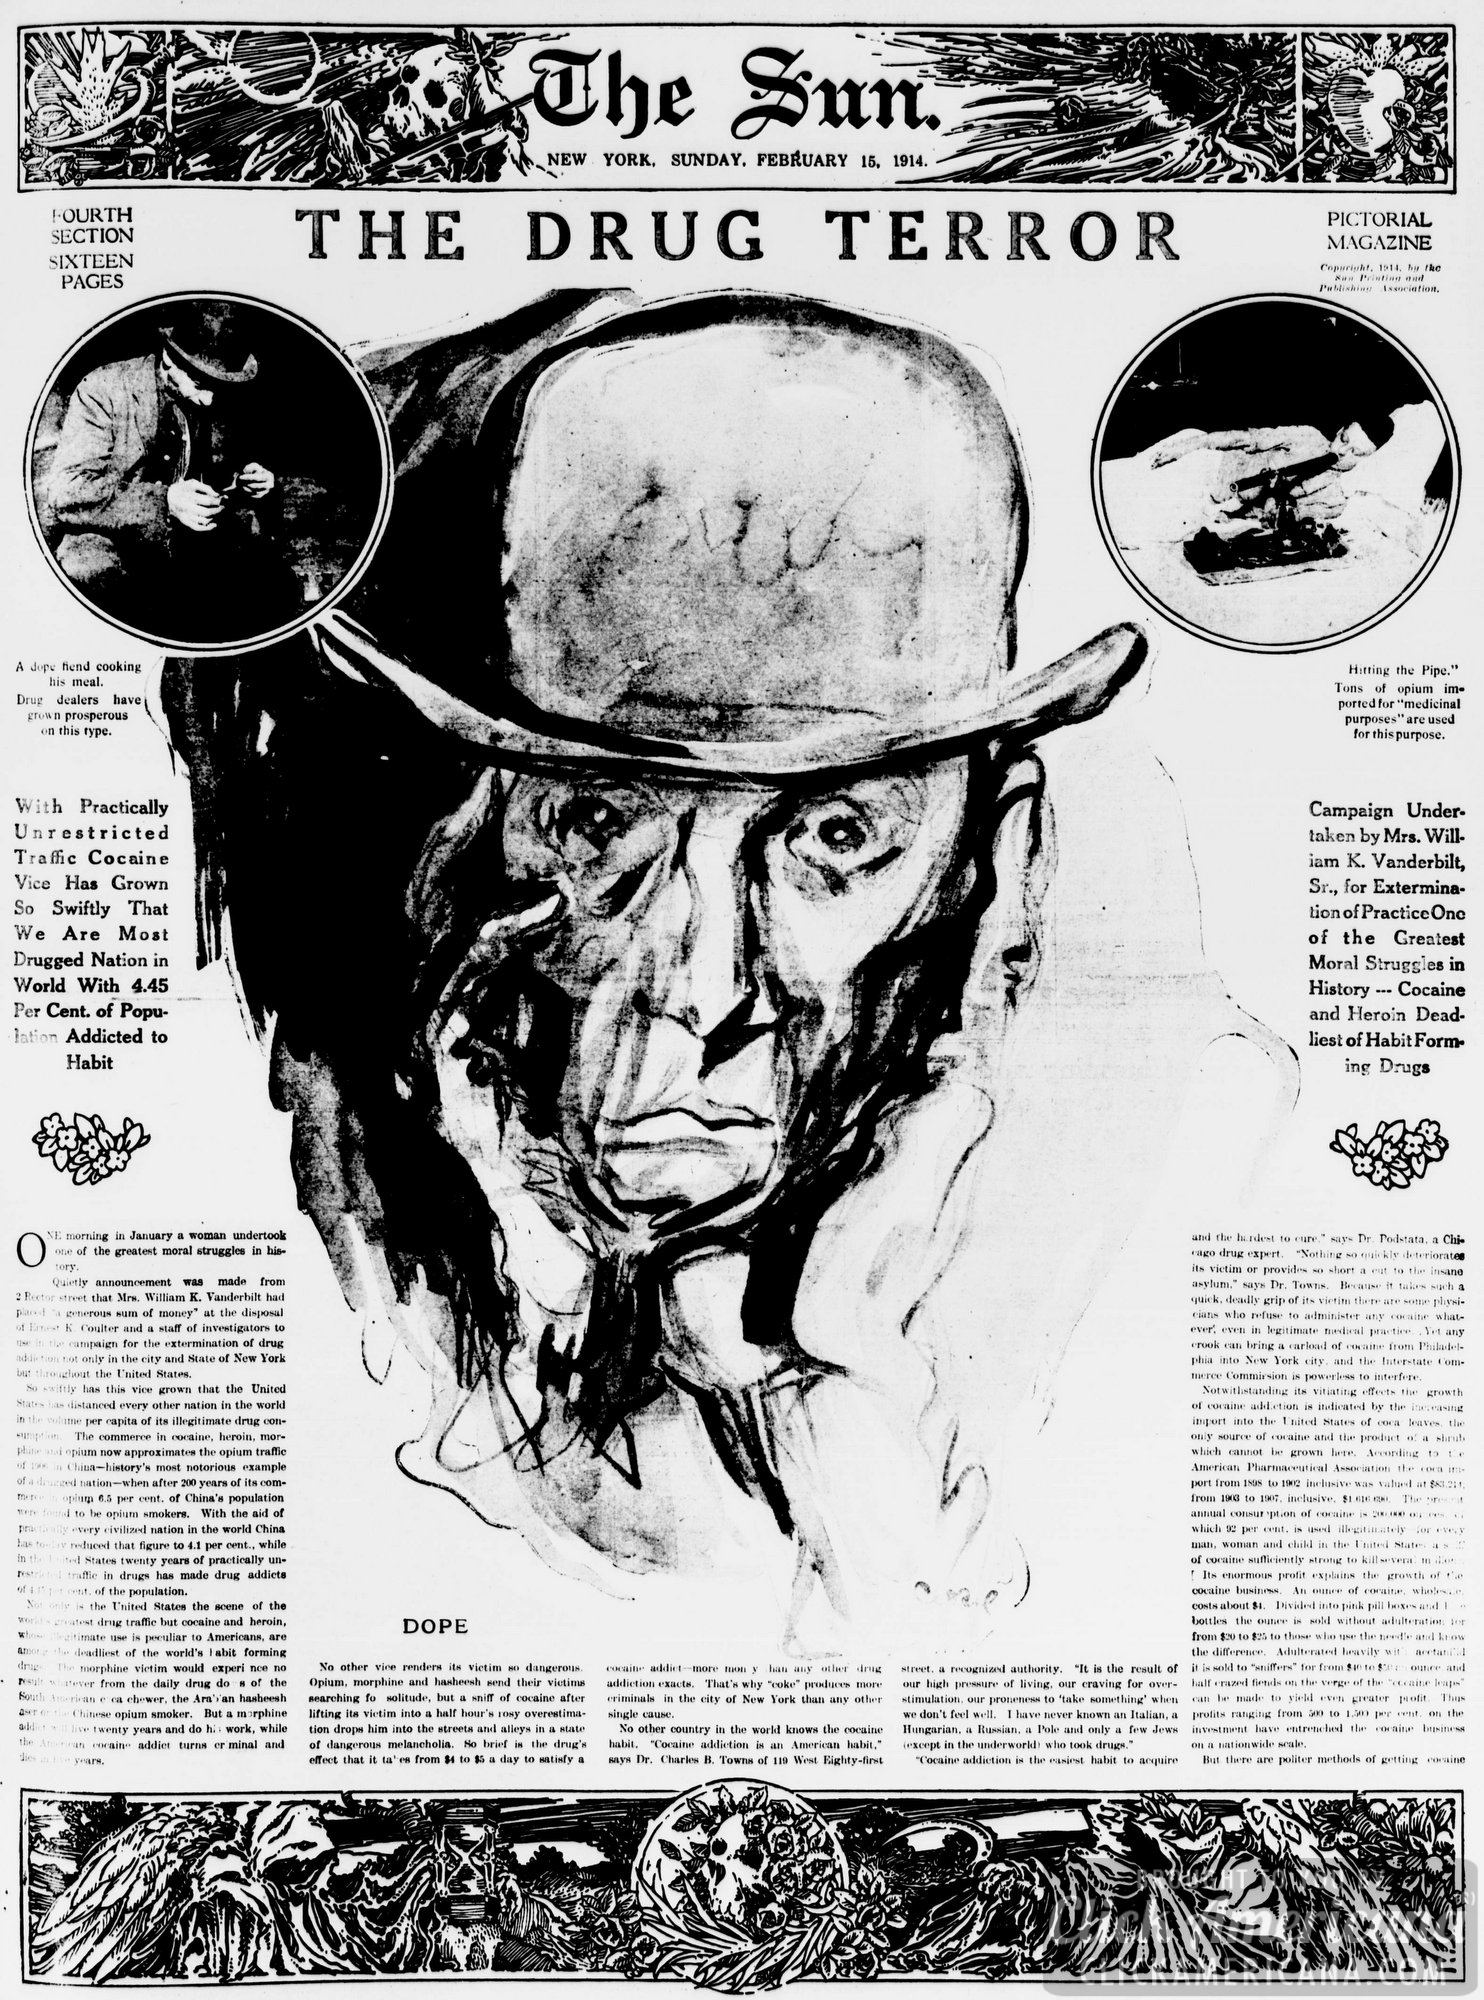 The drug terror: American cocaine addicts (1914)